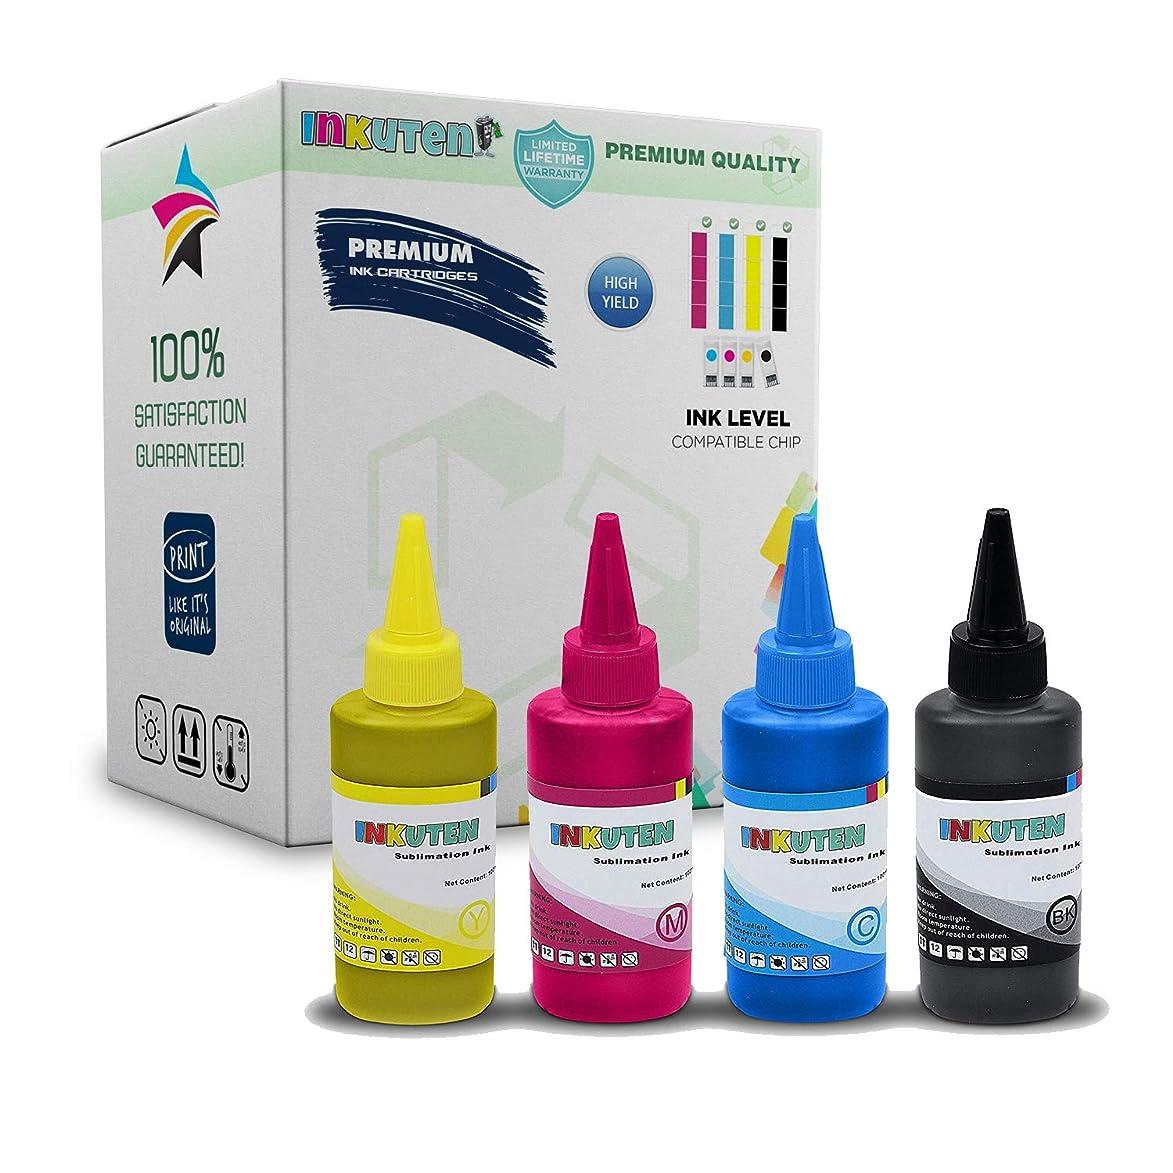 INKUTEN 4x100ml Premium Sublimation ink for Ricoh SG 3110 2100N 3100 3100SNW 3110DNW 3110DN 3110SFNW SG41 Korean-Made